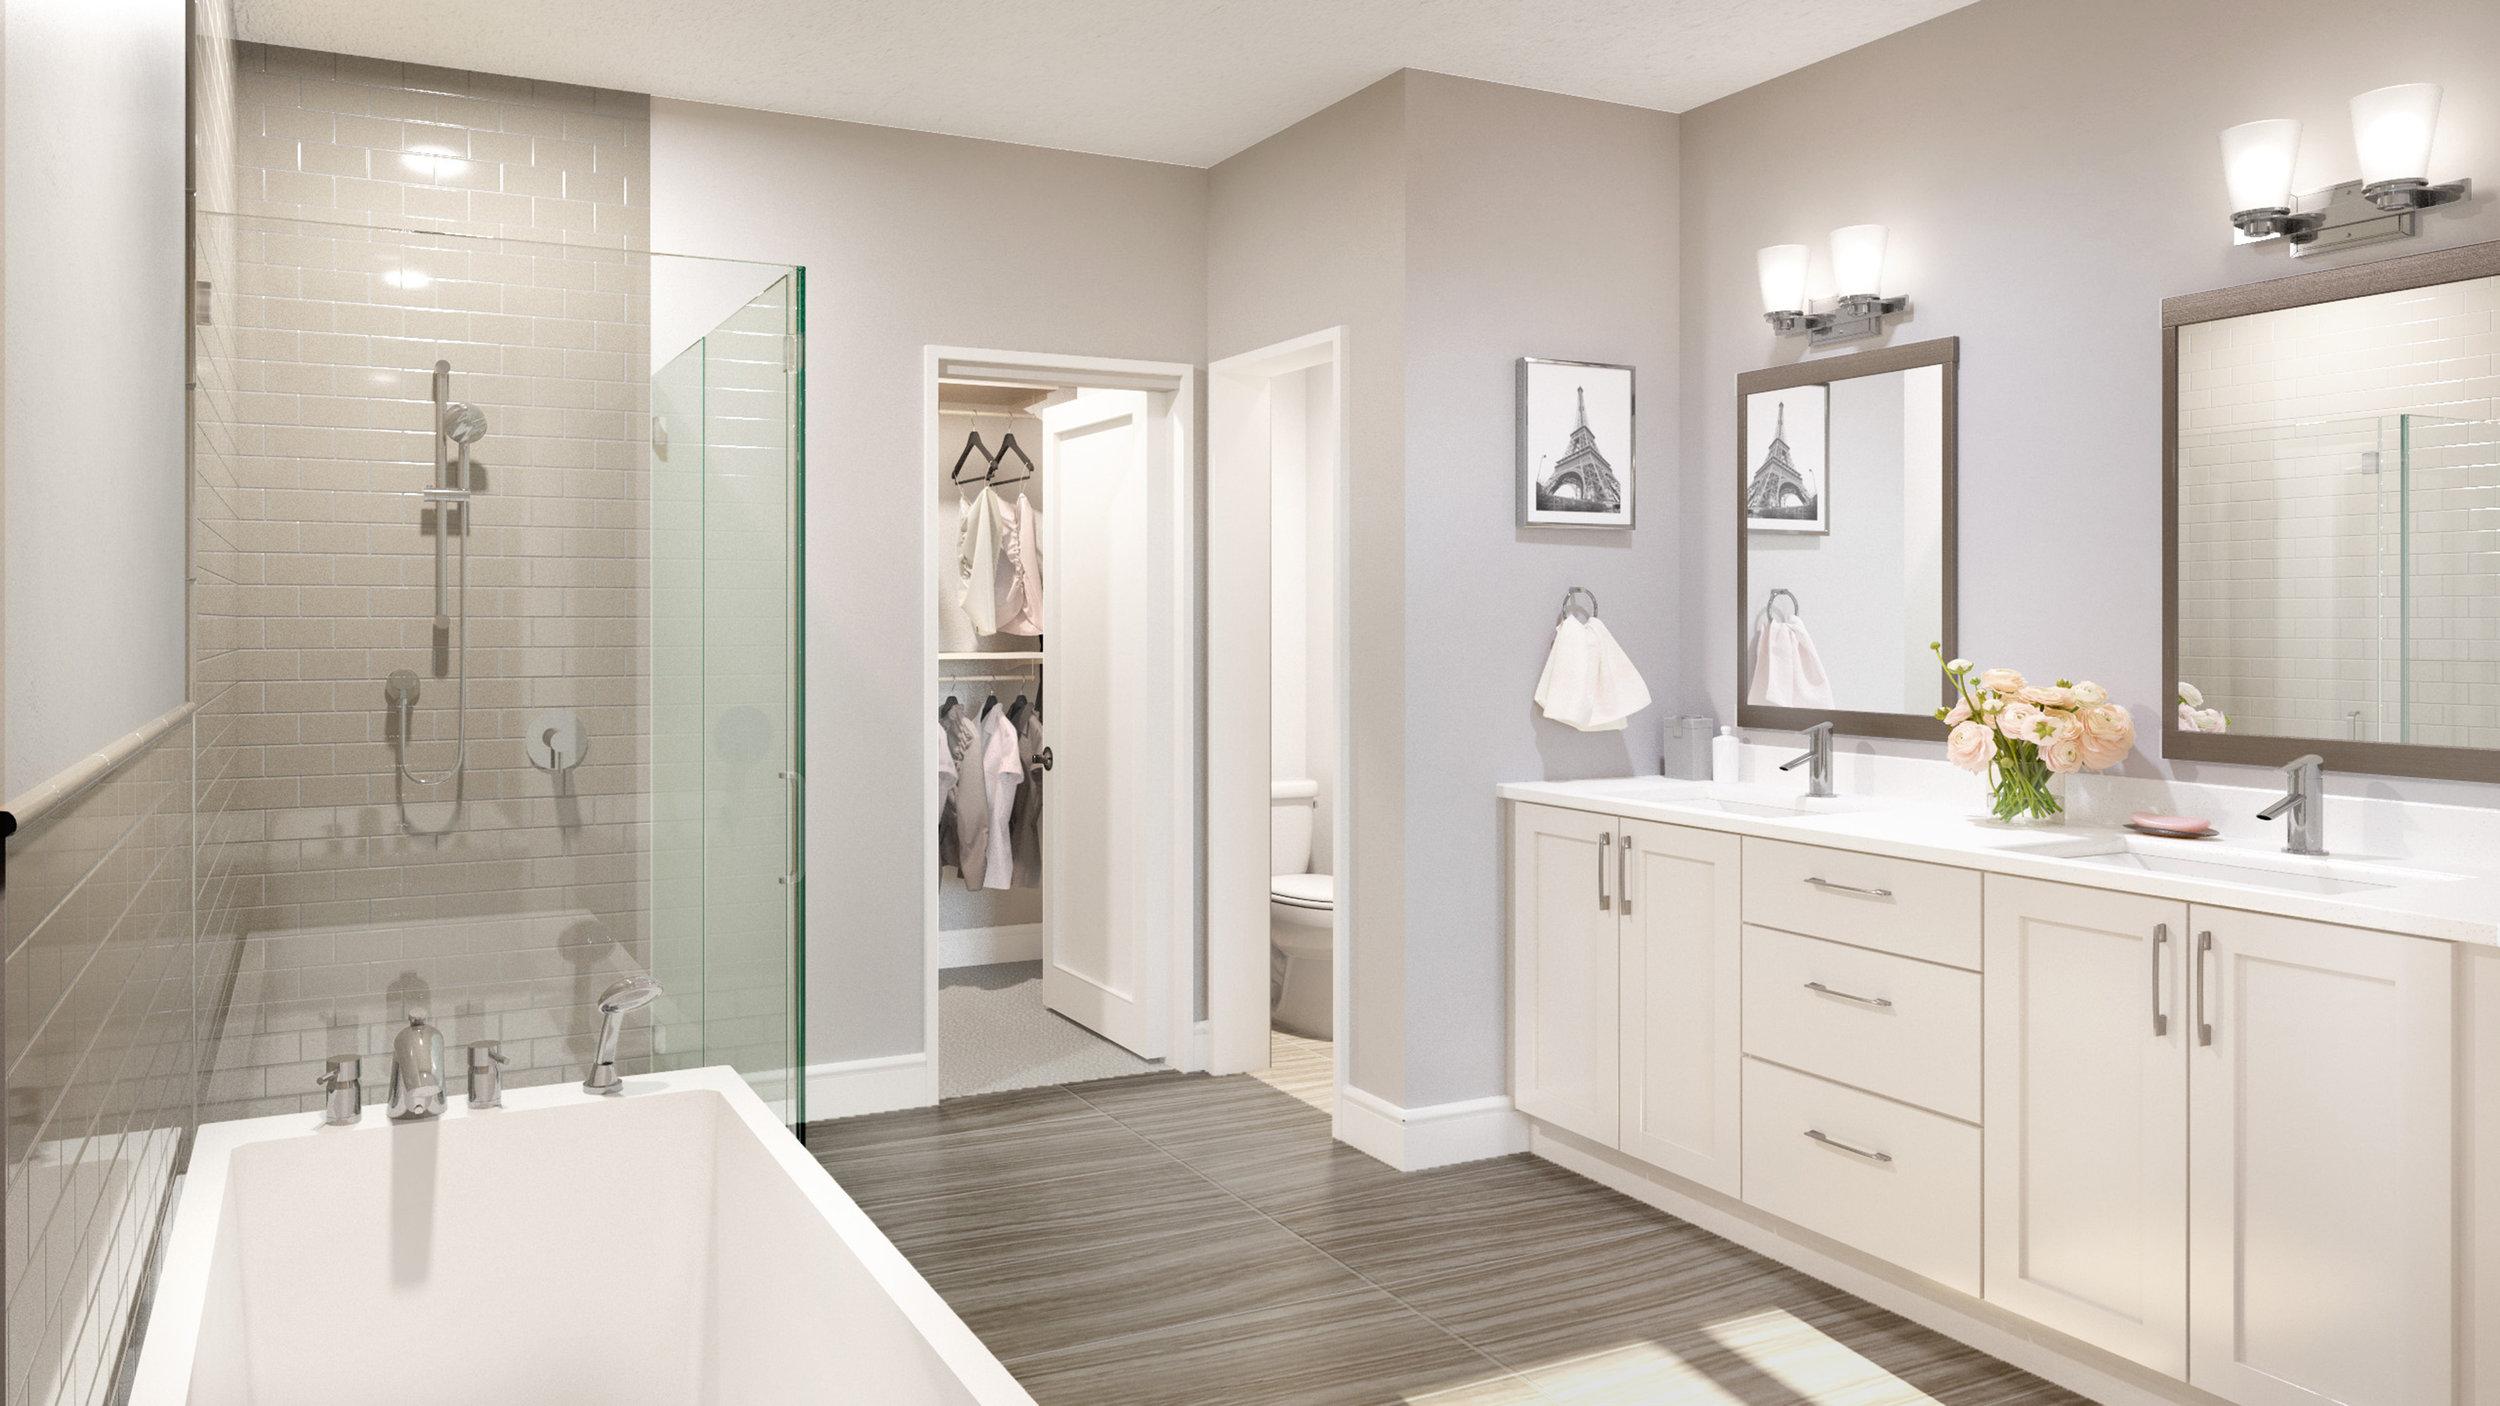 Buckley_Bathroom_1_8a.jpg